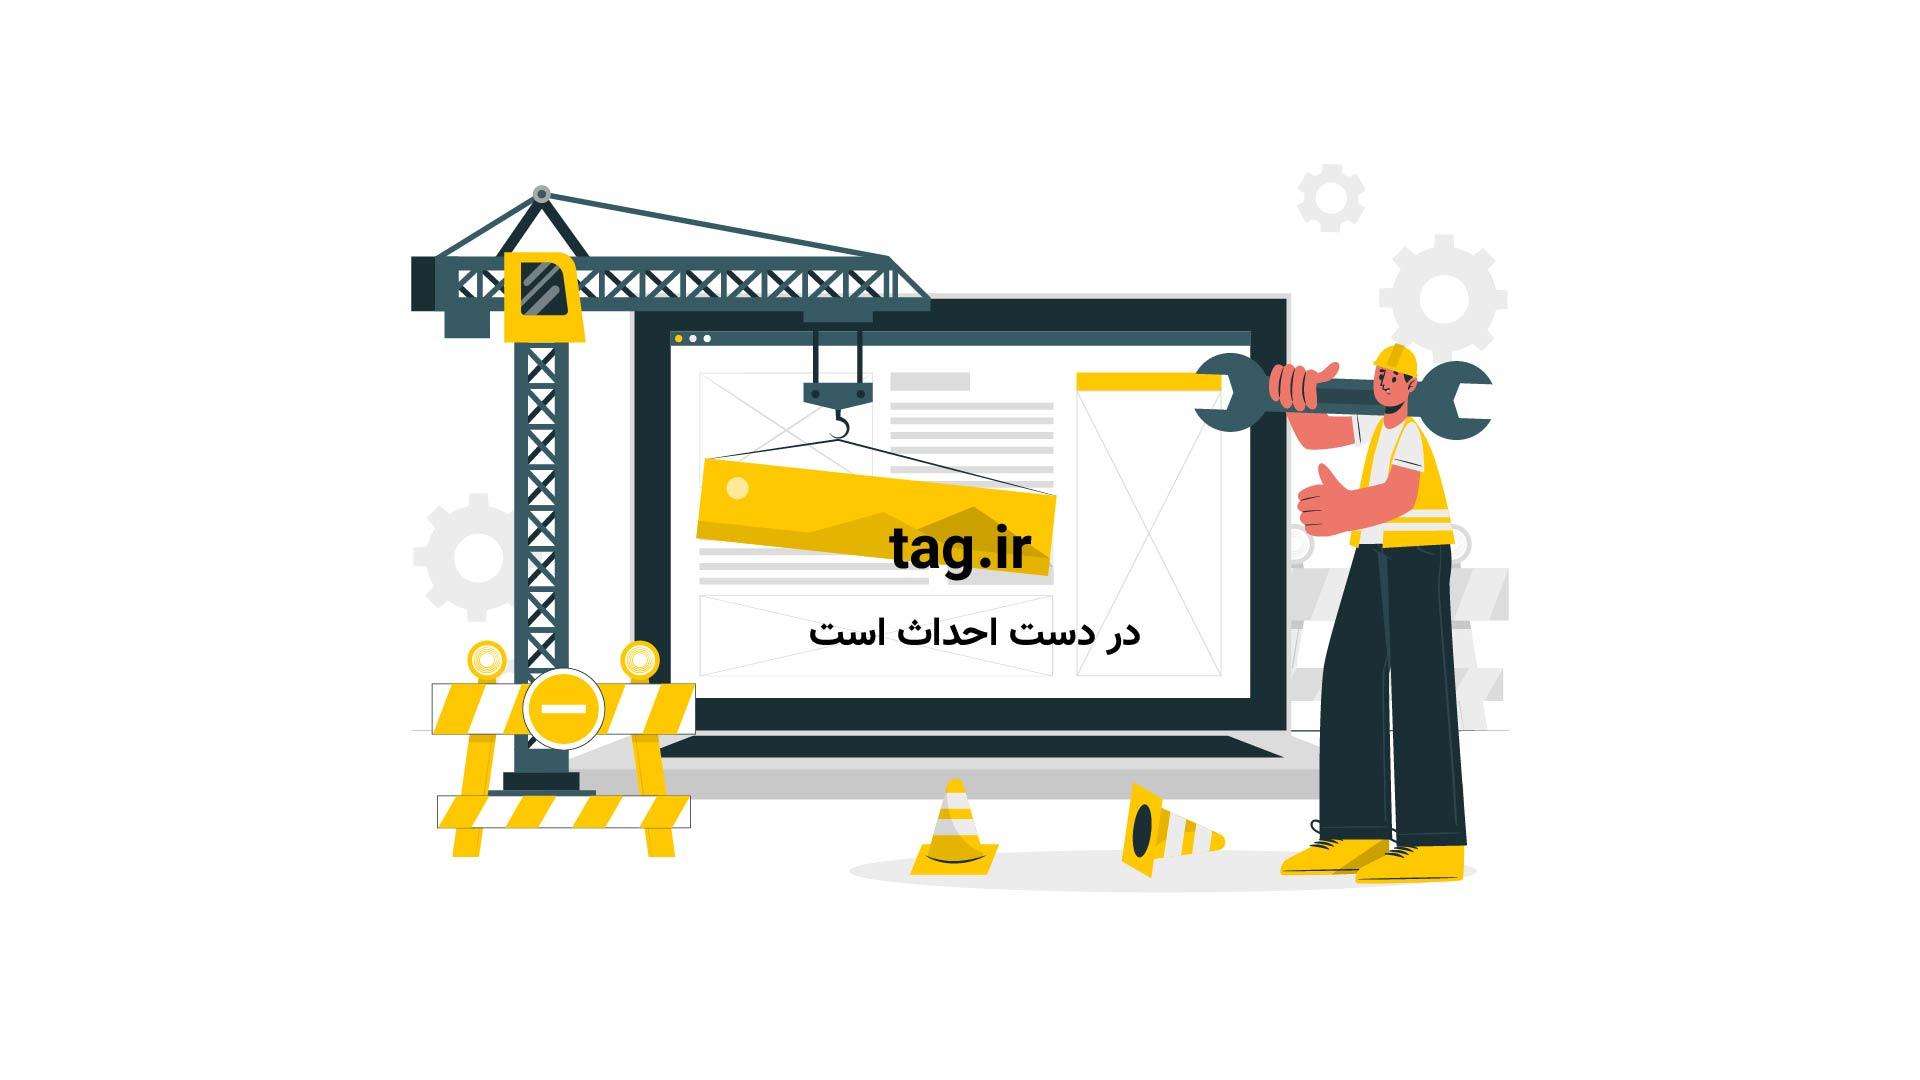 بخش اول: اخبار المپیک ریو 2016 (95.05.14) + فیلم